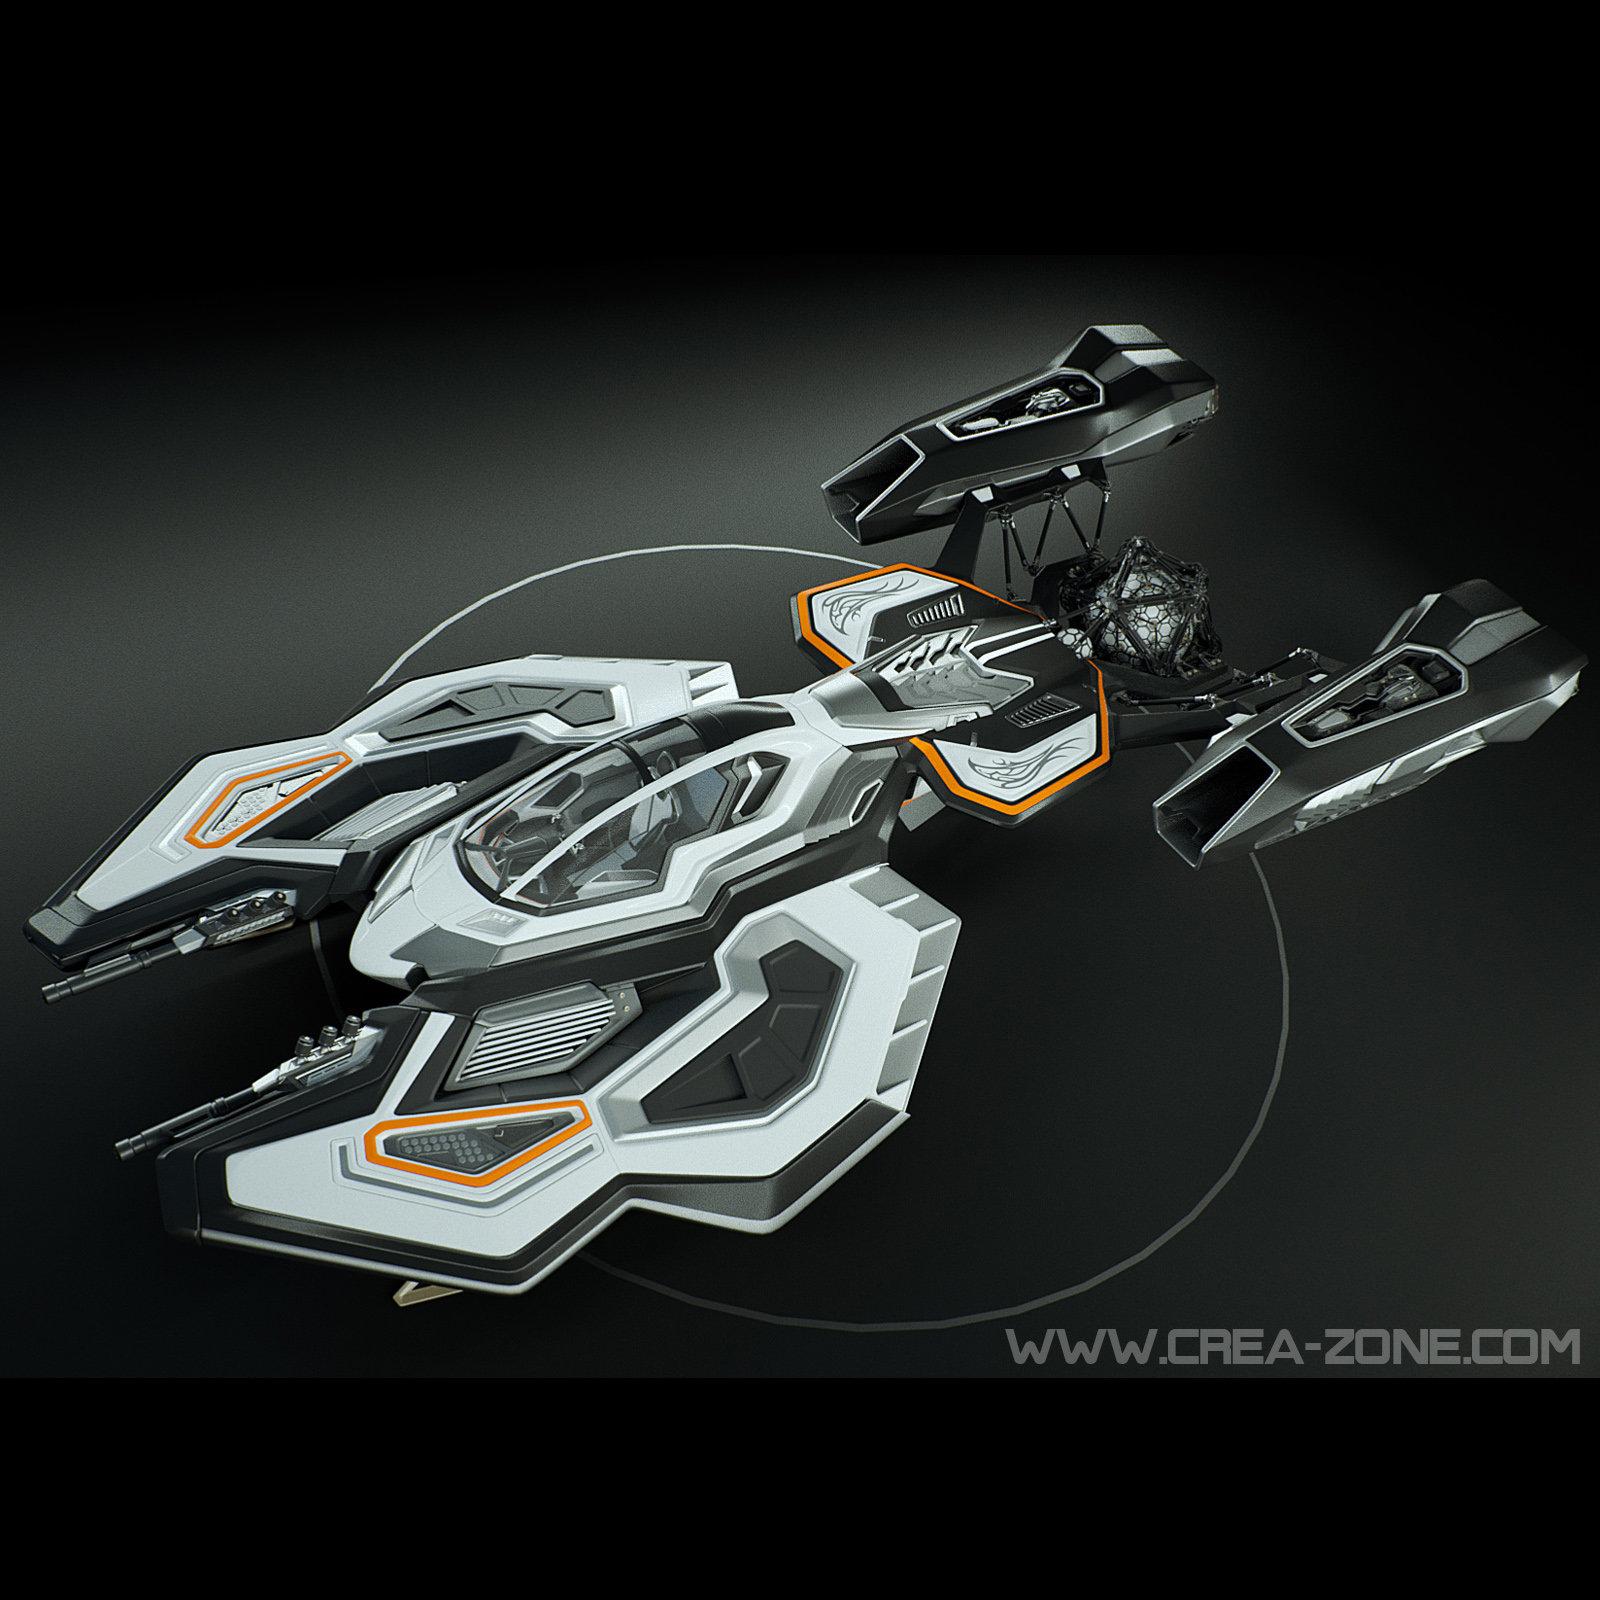 Spaceship 3D concept